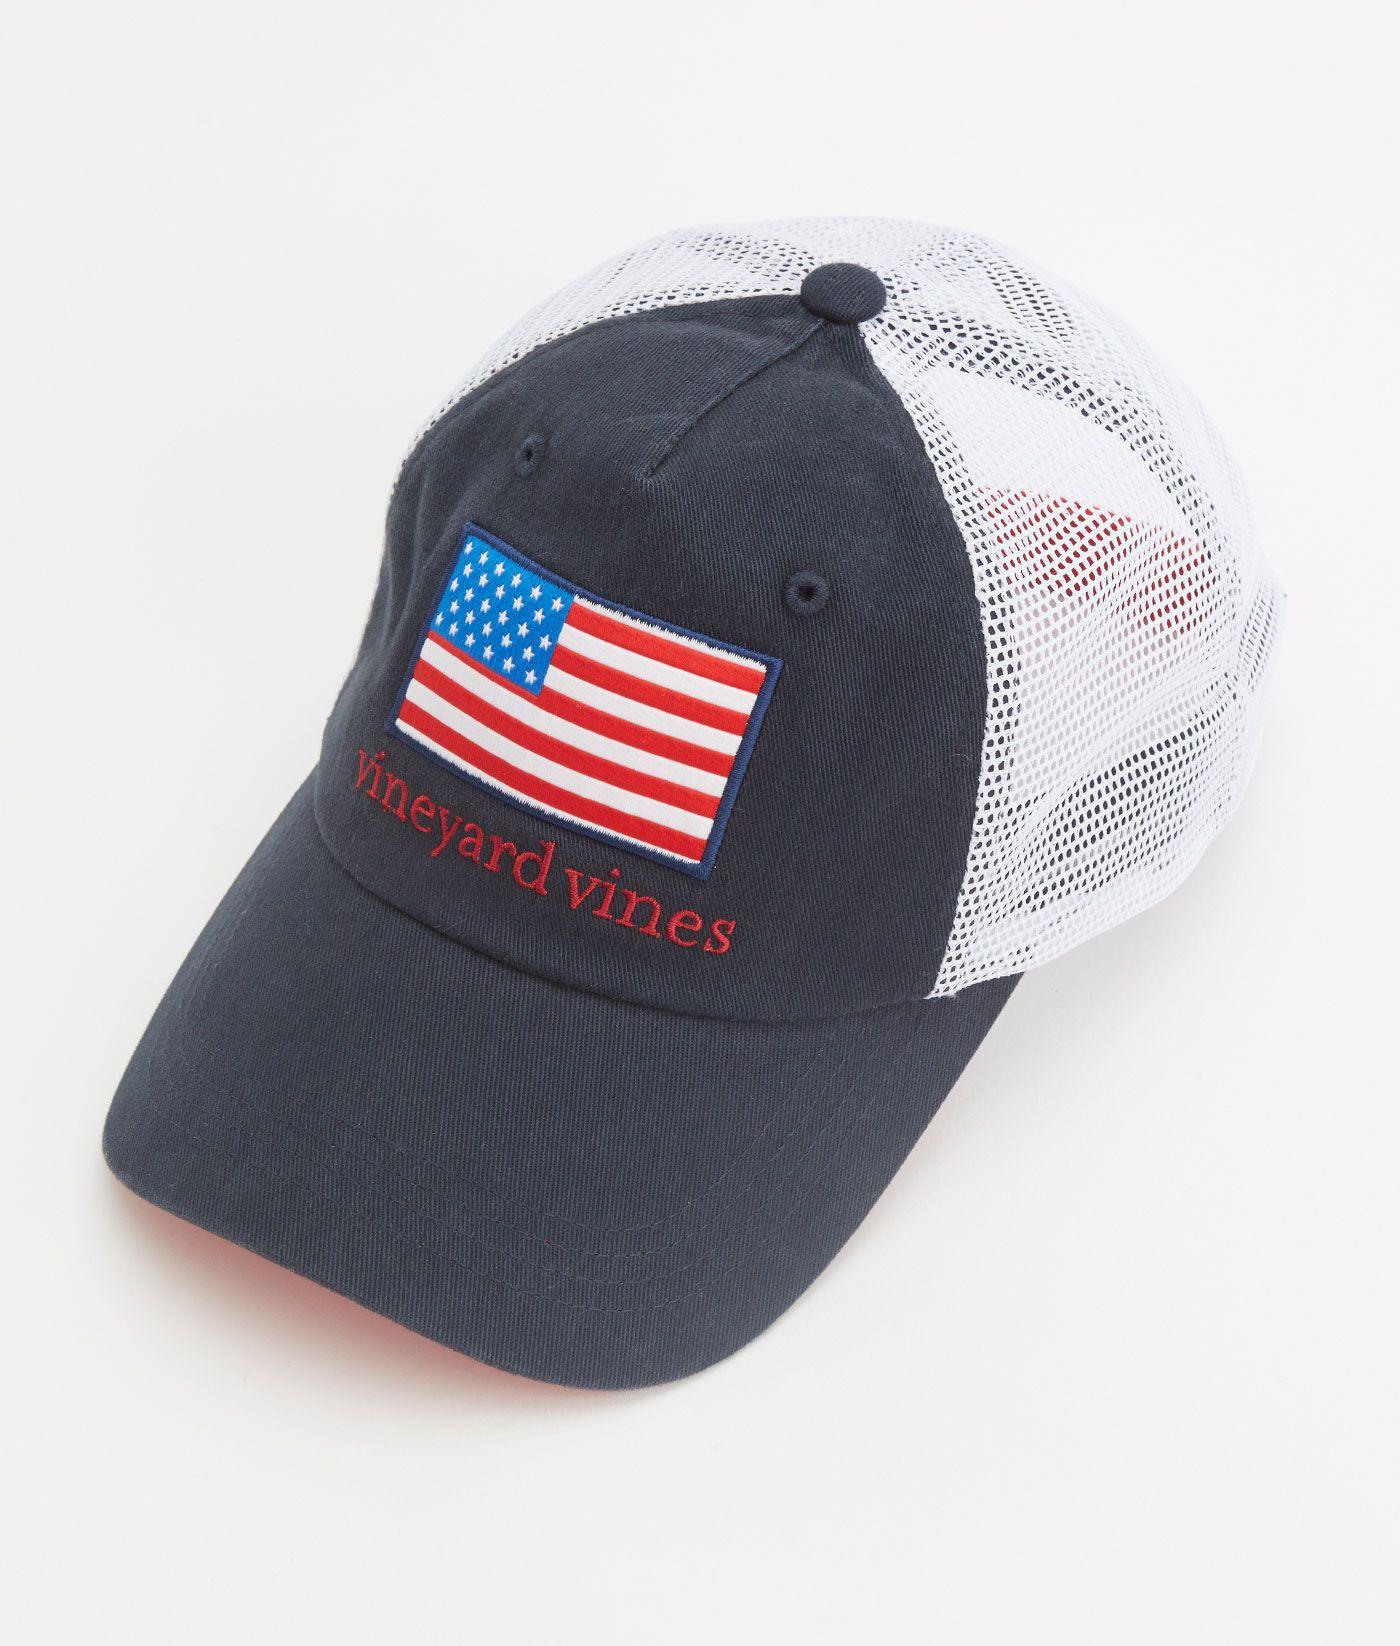 68b5b90e Shop American Flag Patch Trucker Hat at vineyard vines | Things to ...